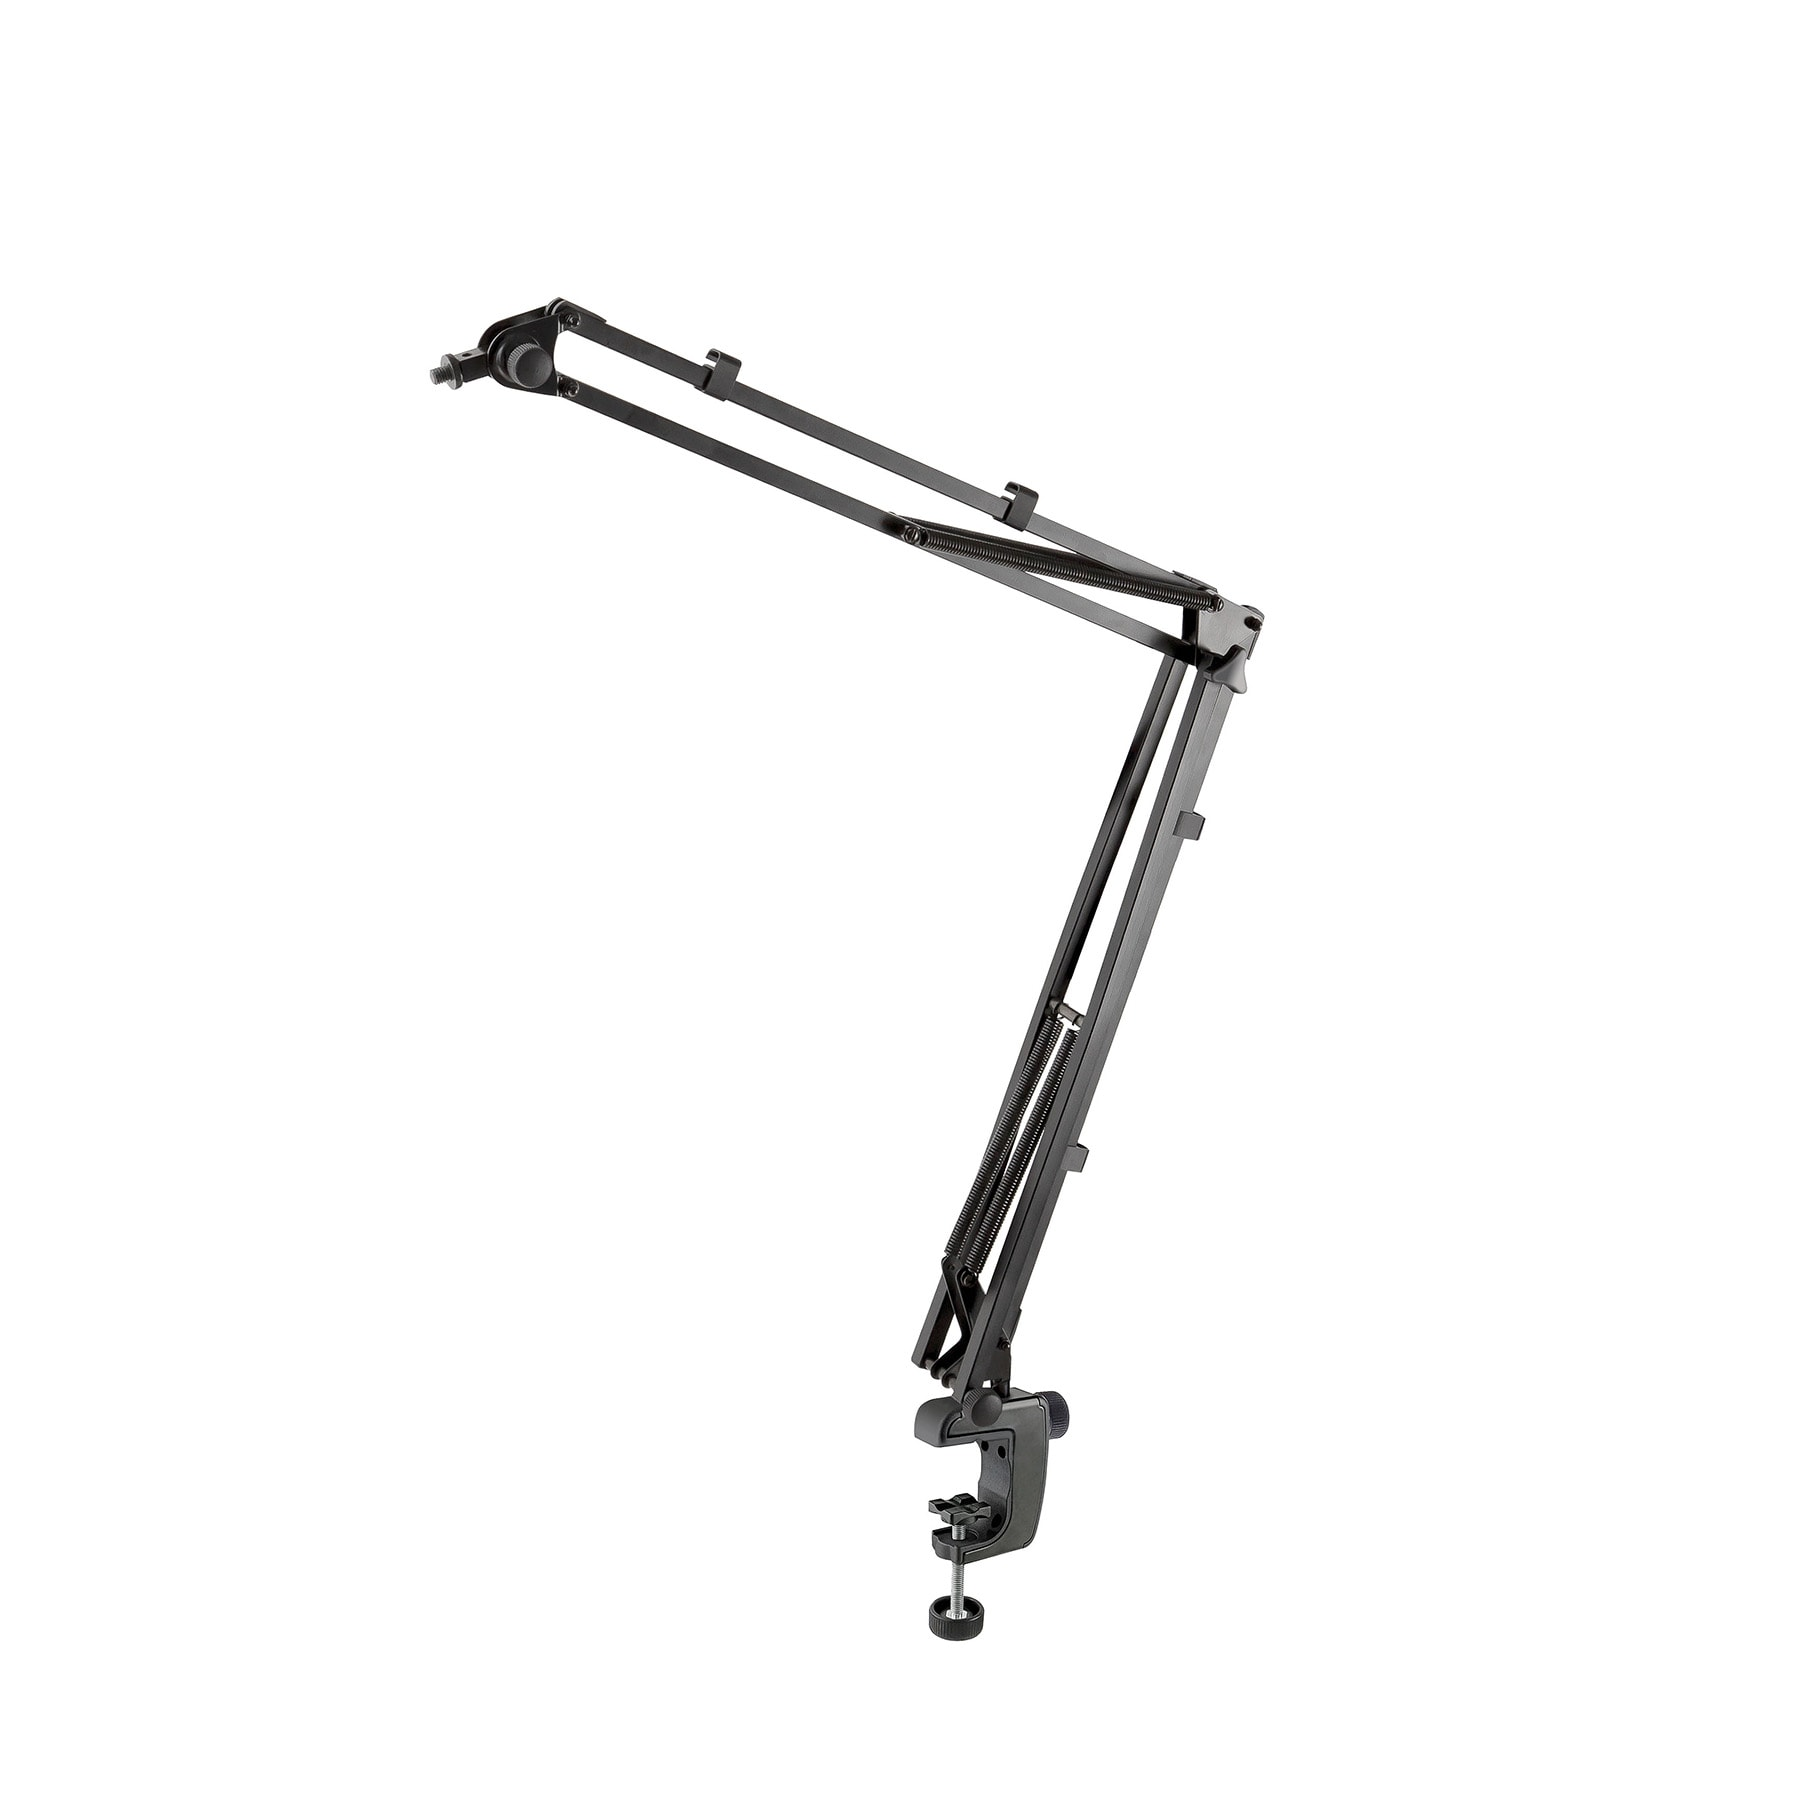 KM23840 - Microphone desk arm